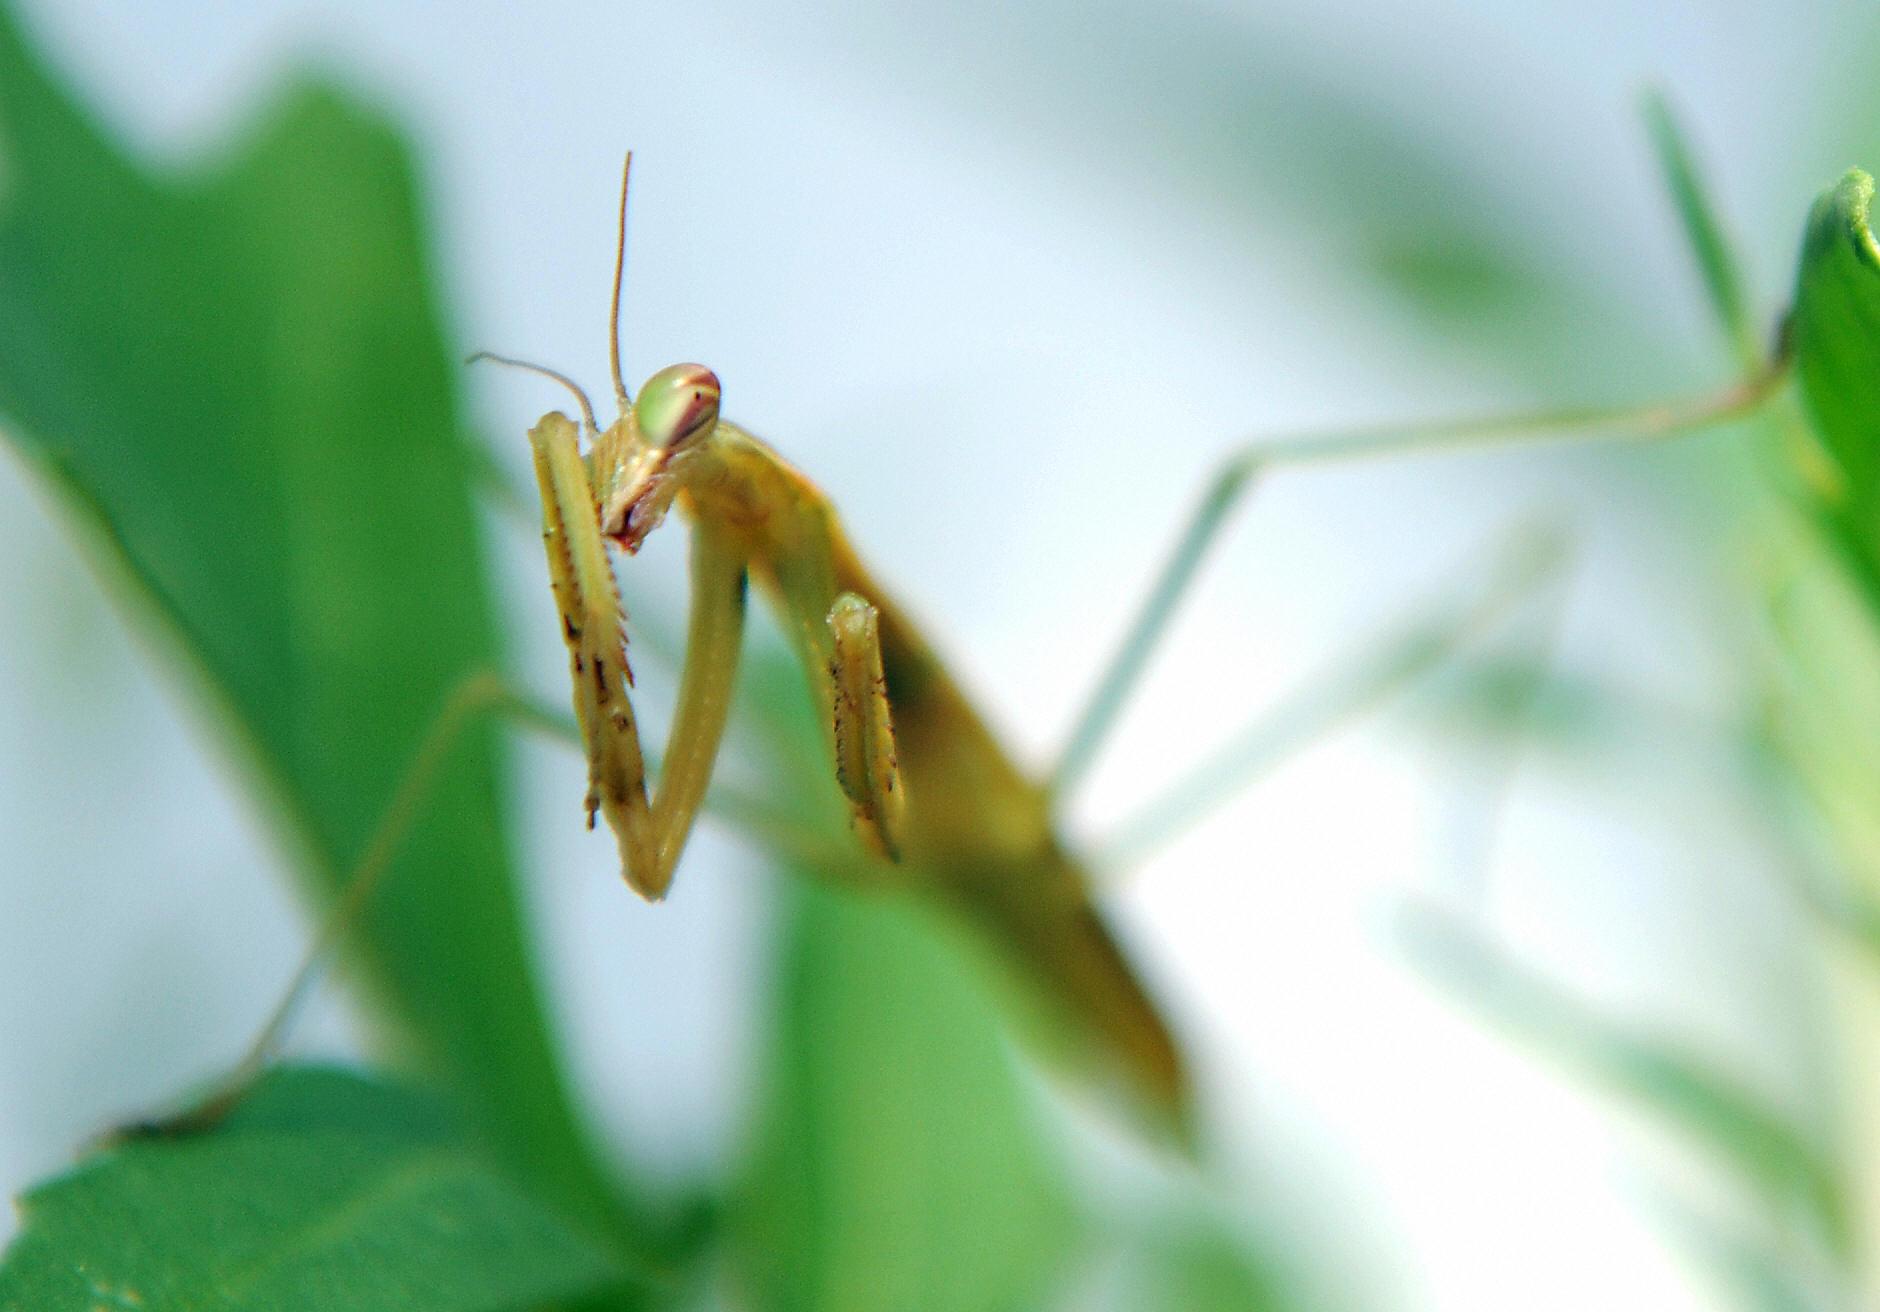 Super slo-mo reveals how the praying mantis avoids a crash landing ...